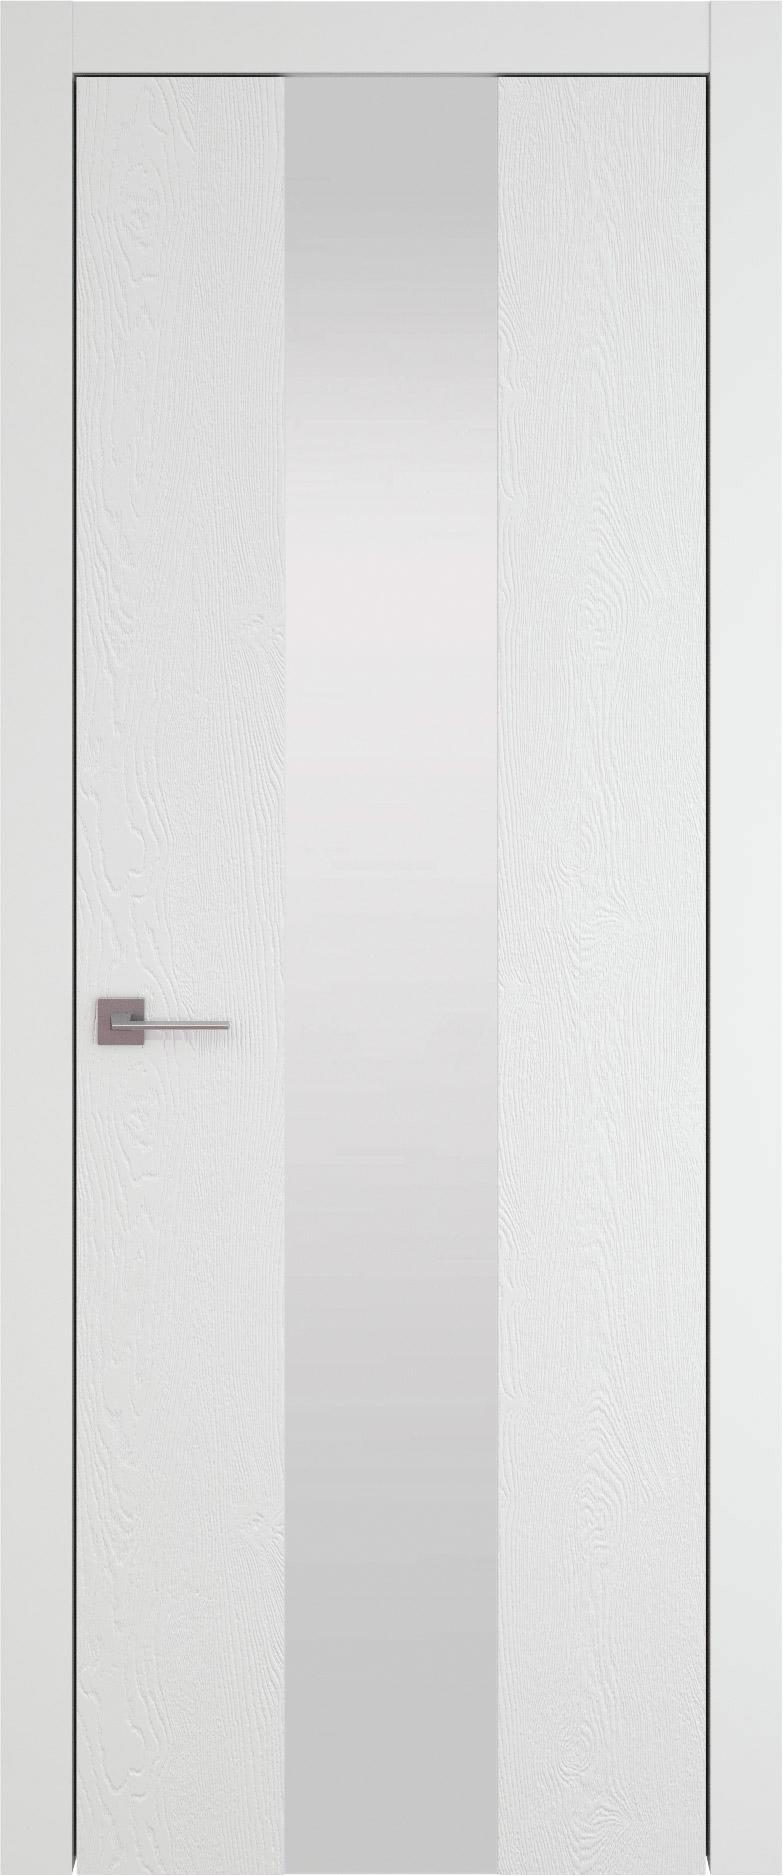 Tivoli Ж-1 цвет - Белая эмаль по шпону (RAL 9003) Со стеклом (ДО)